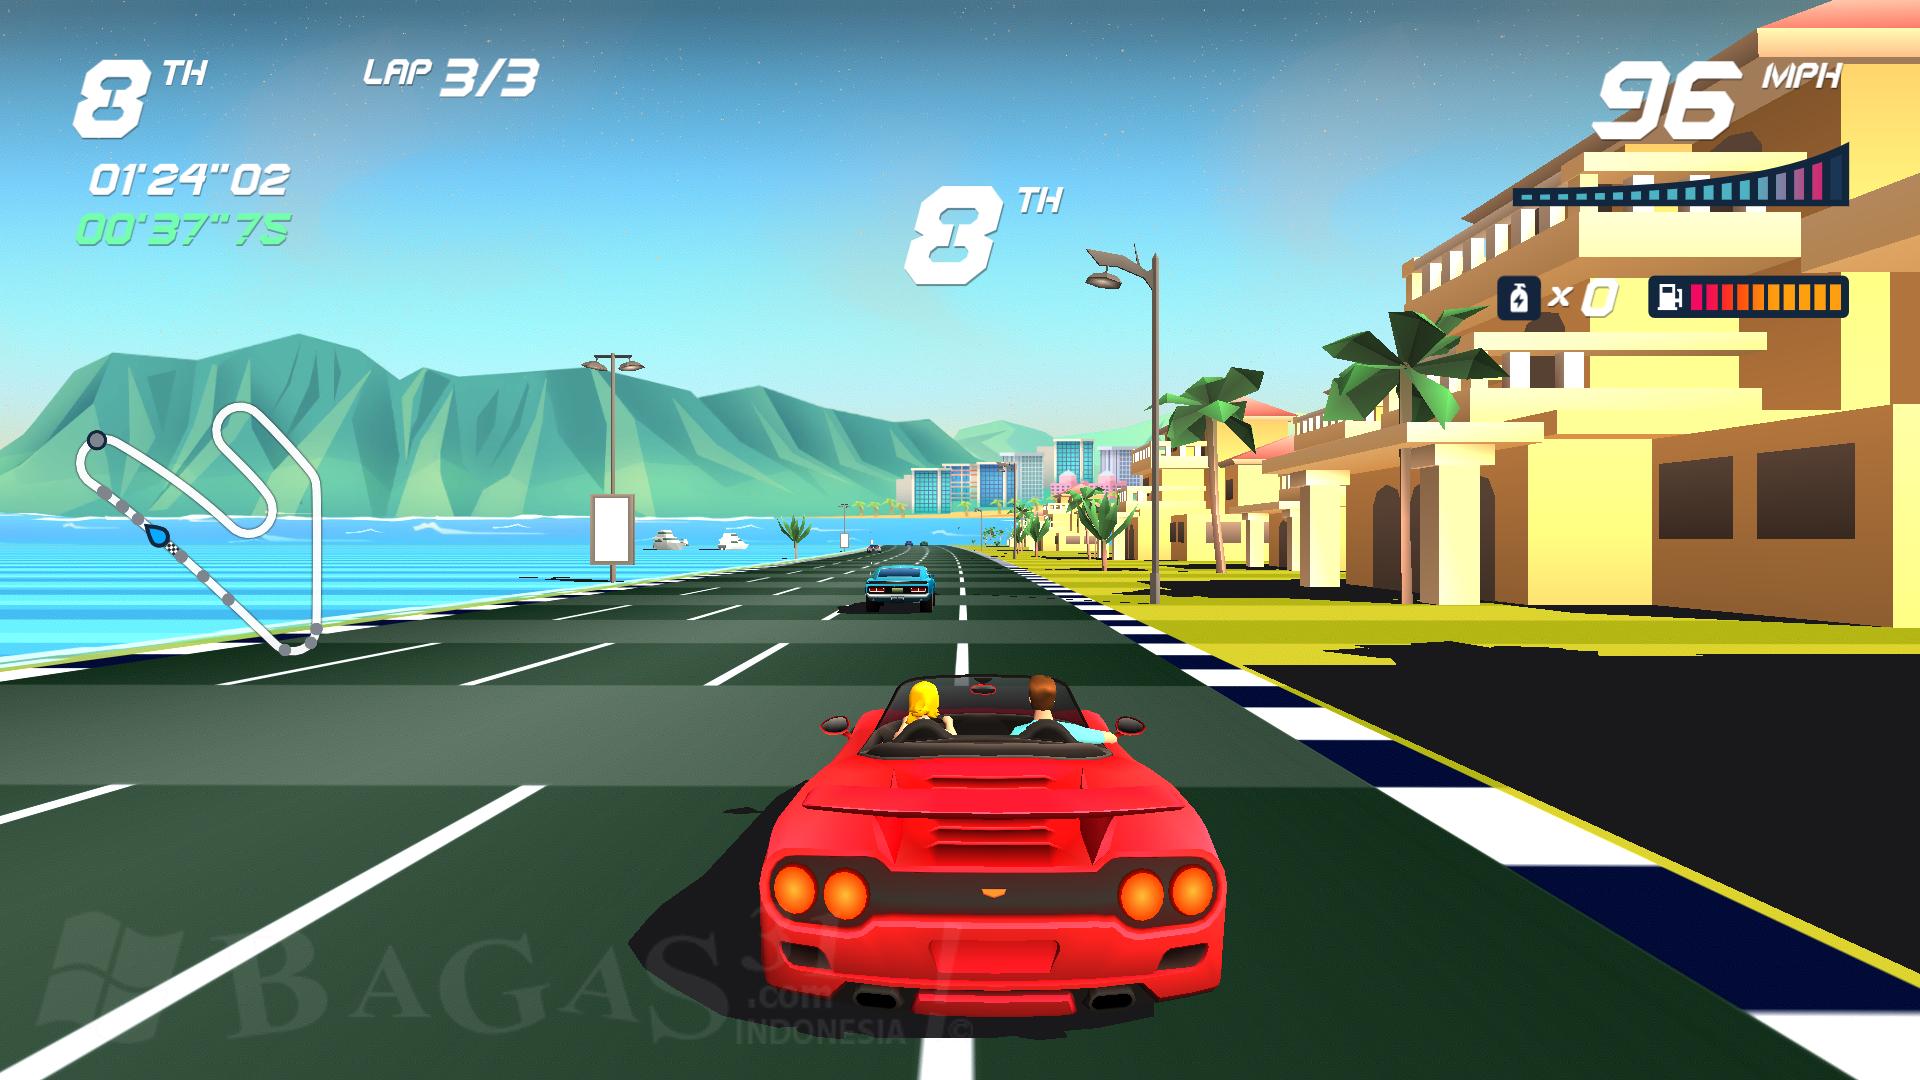 Horizon Chase Turbo Summer Vibes Full Version